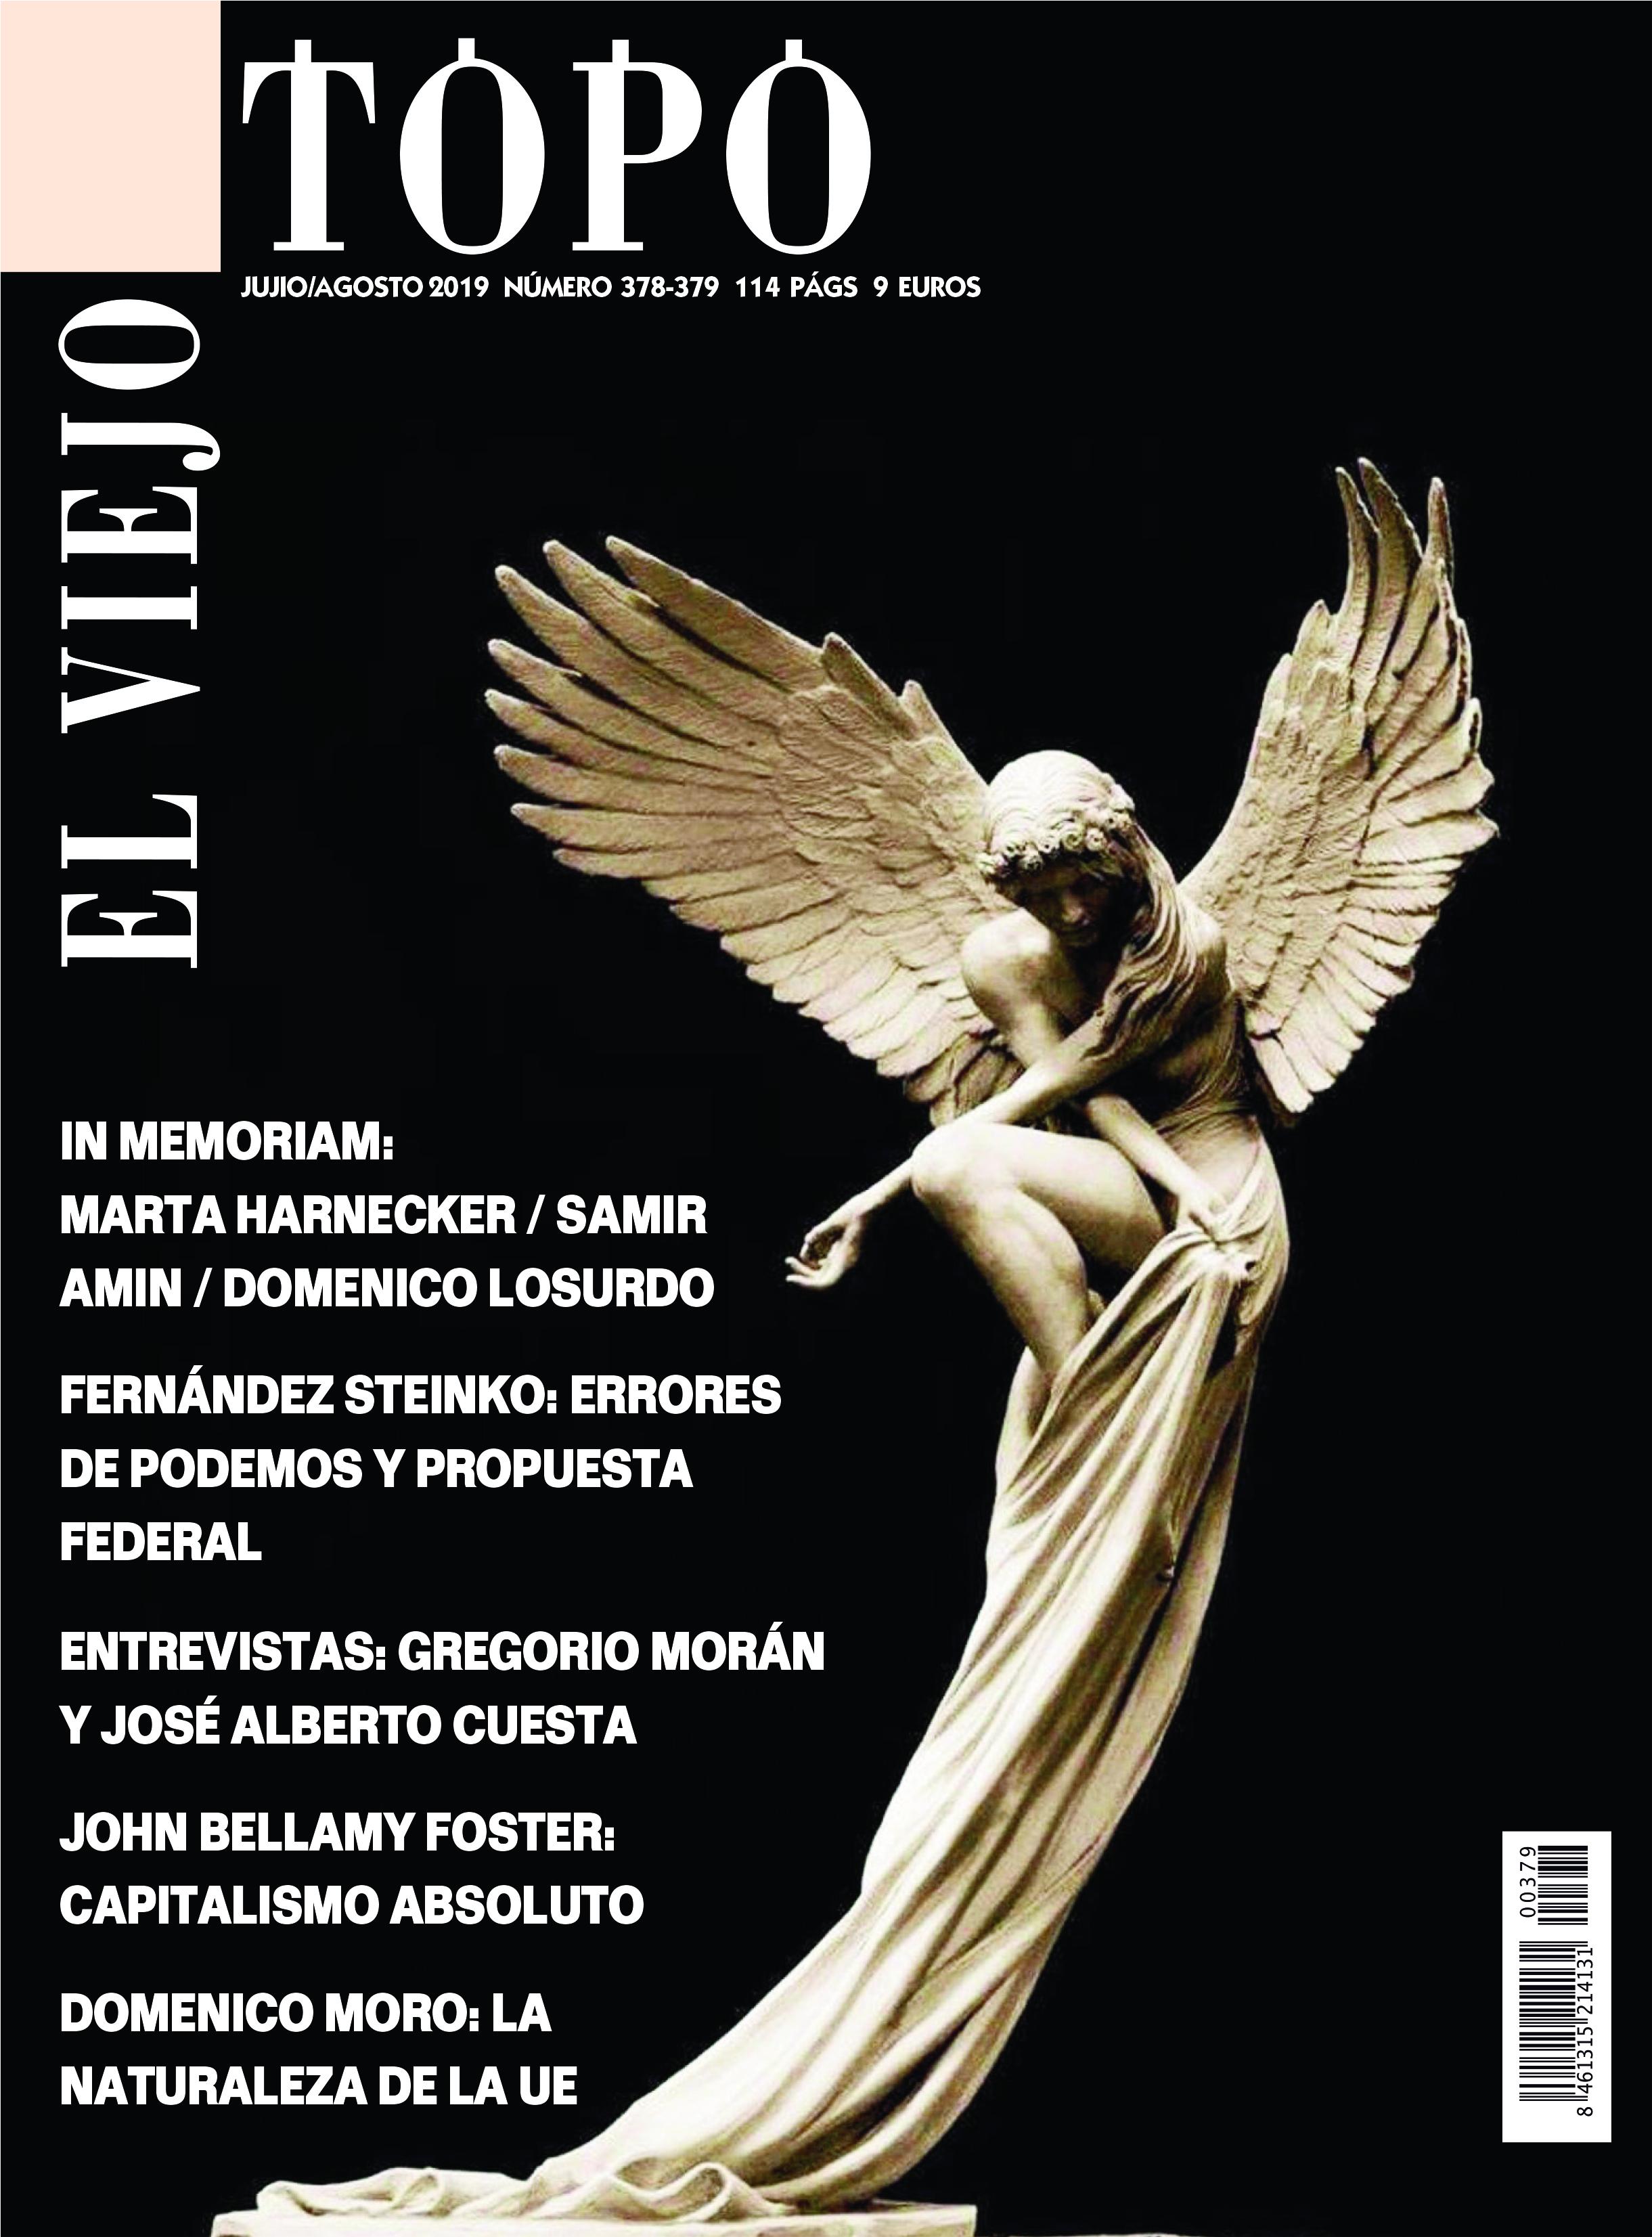 Revista El Viejo Topo 378/379 julio agosto 2019